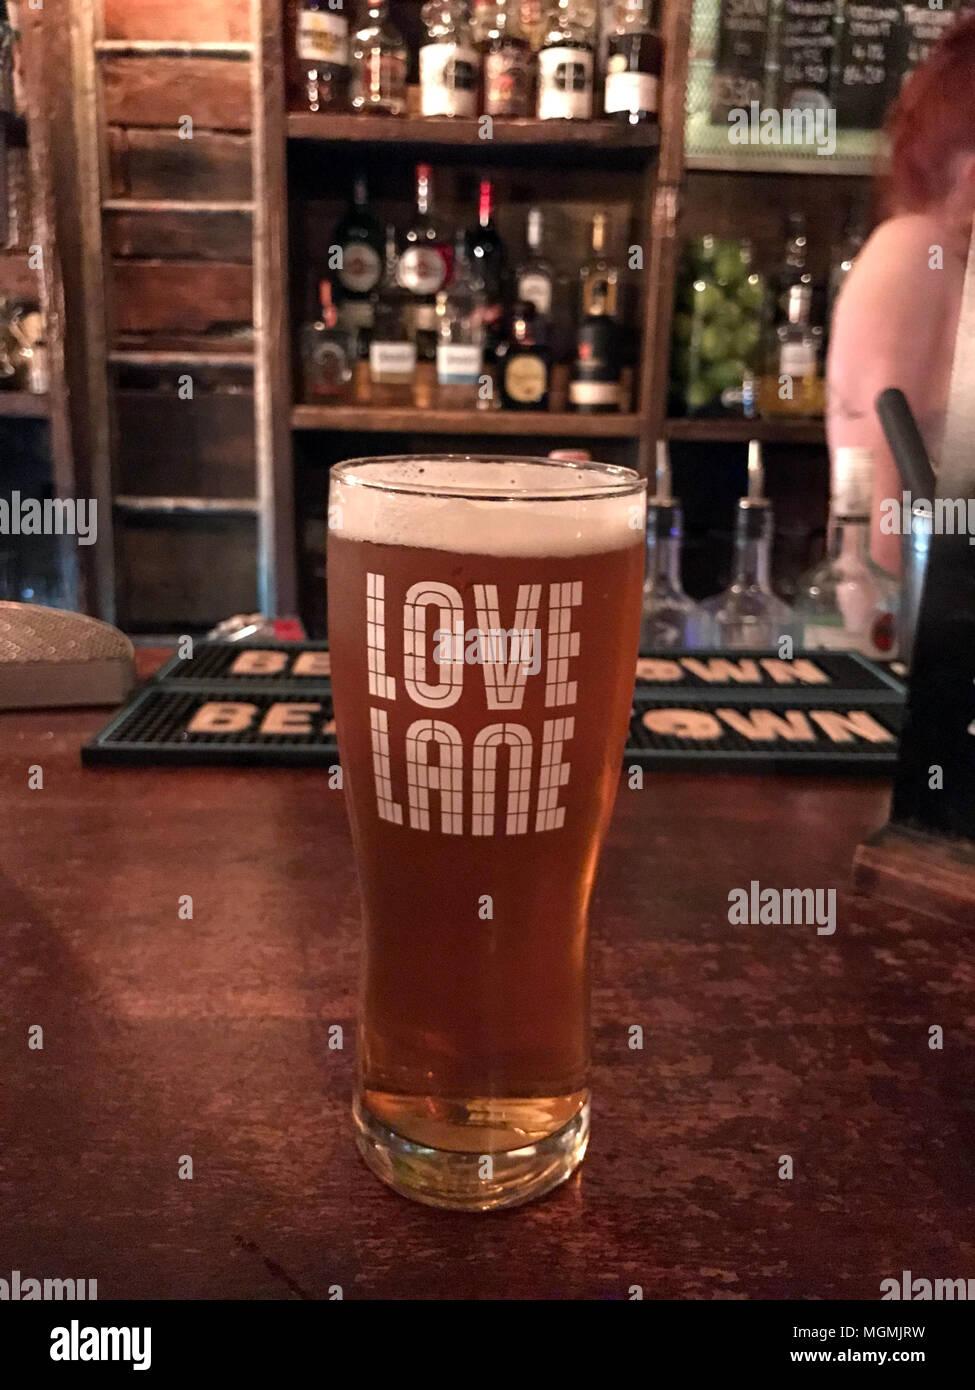 Love Lane Brewery Pint Pot Glass, on a bar Stock Photo